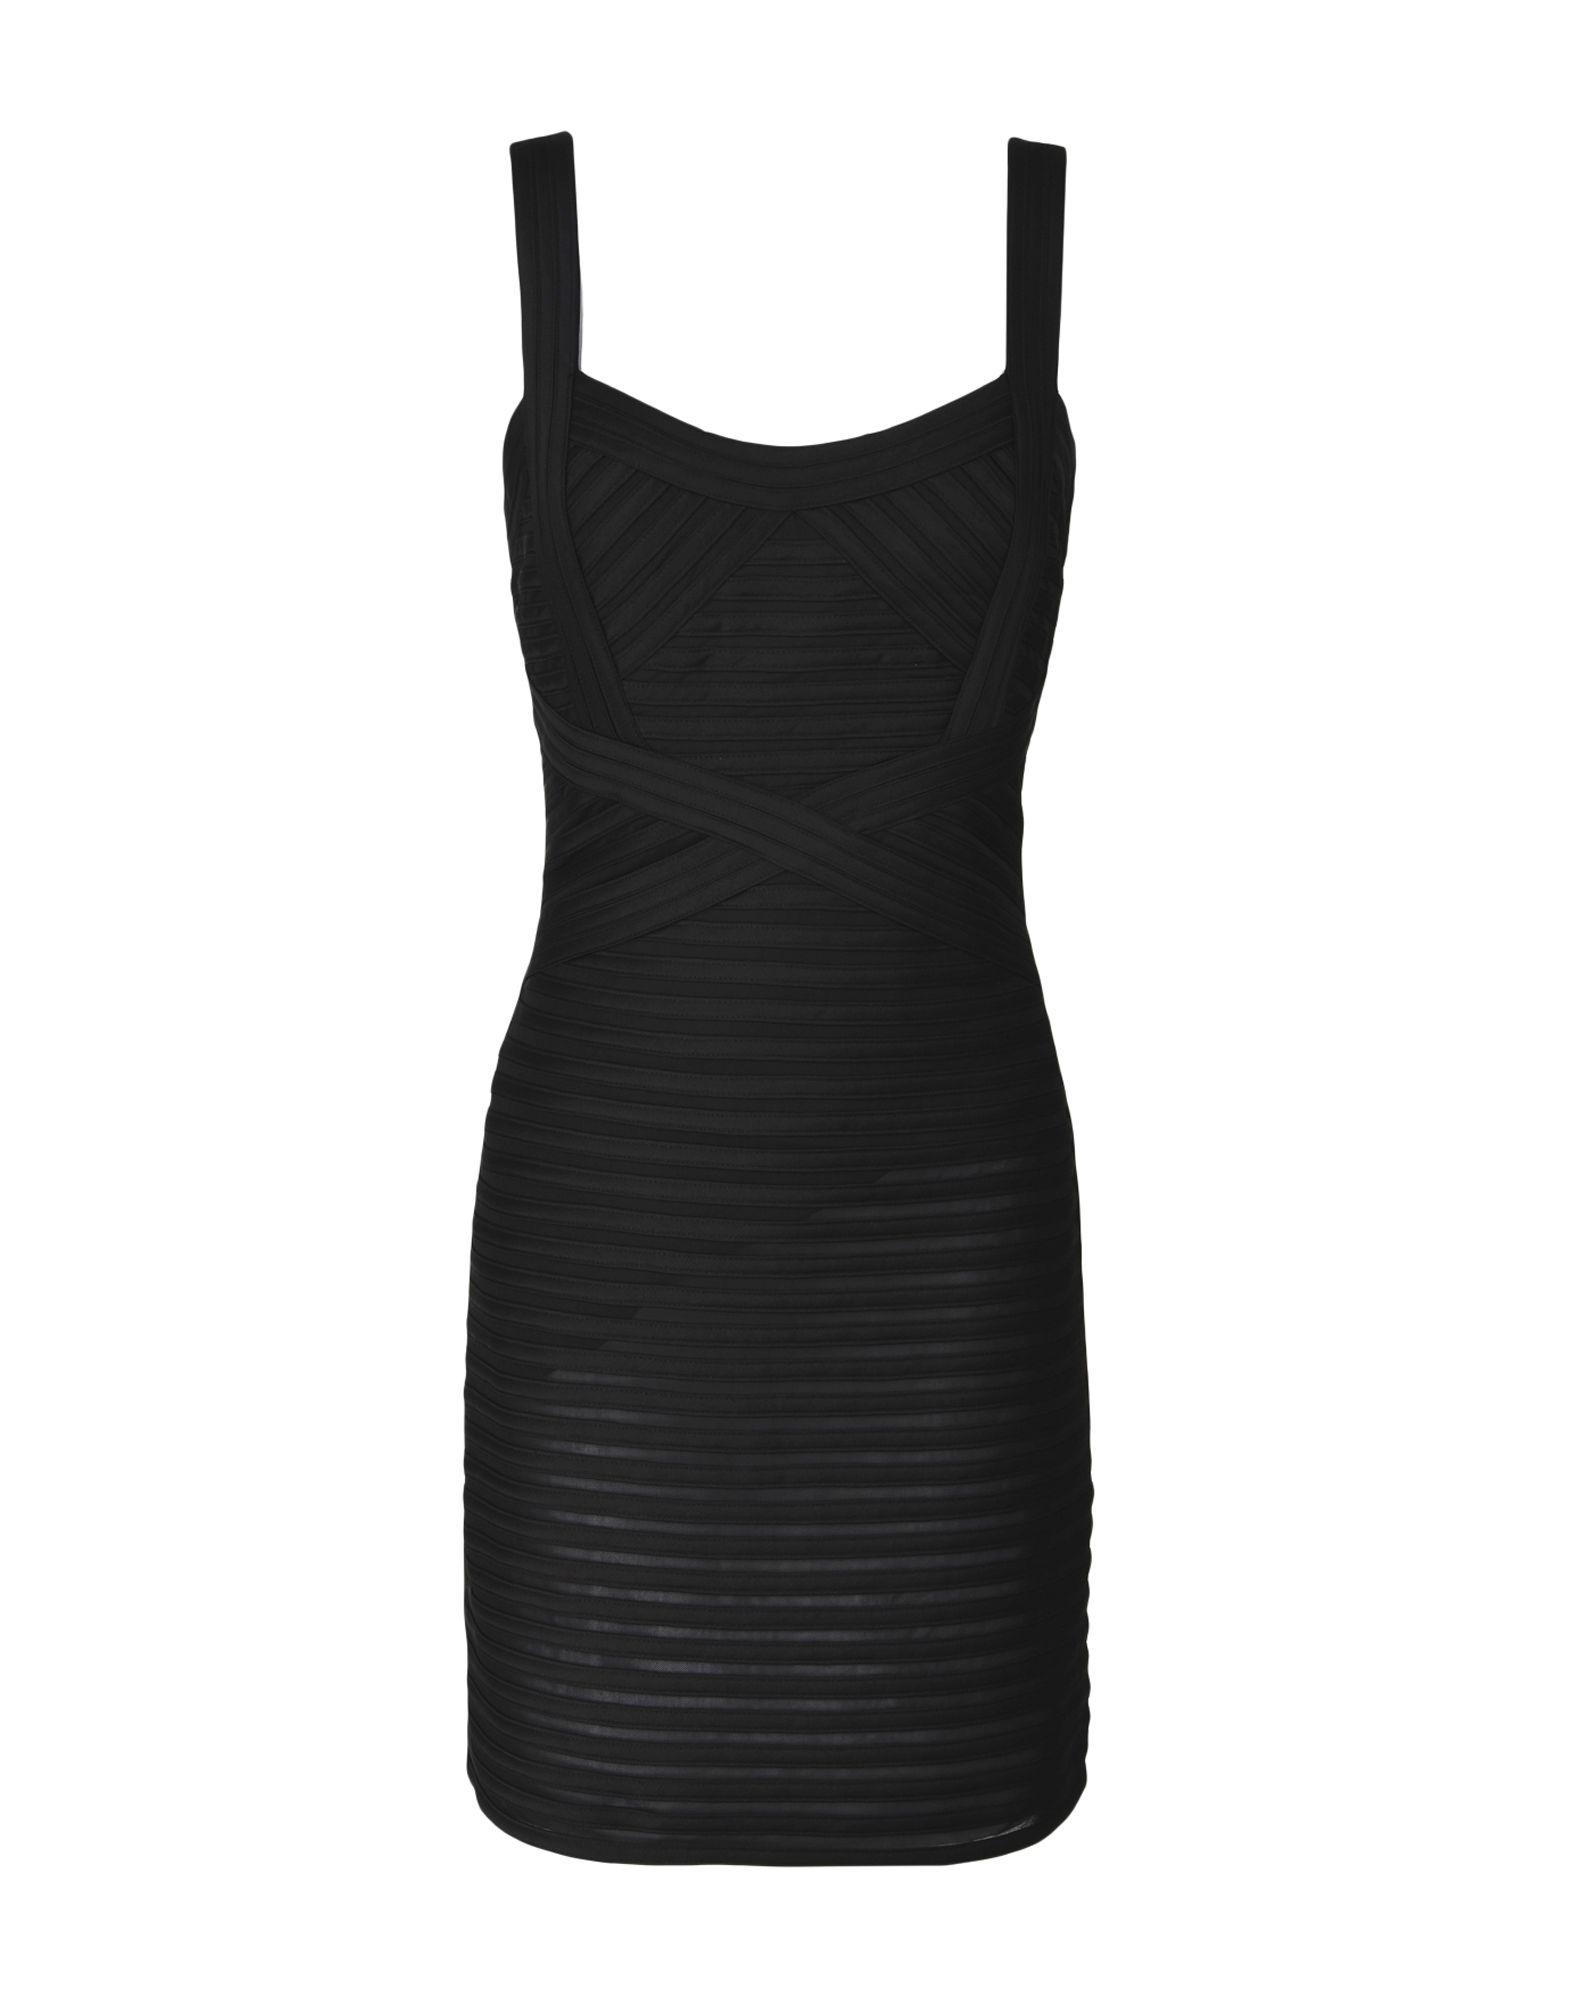 jolie короткое платье JOLIE by EDWARD SPIERS Короткое платье